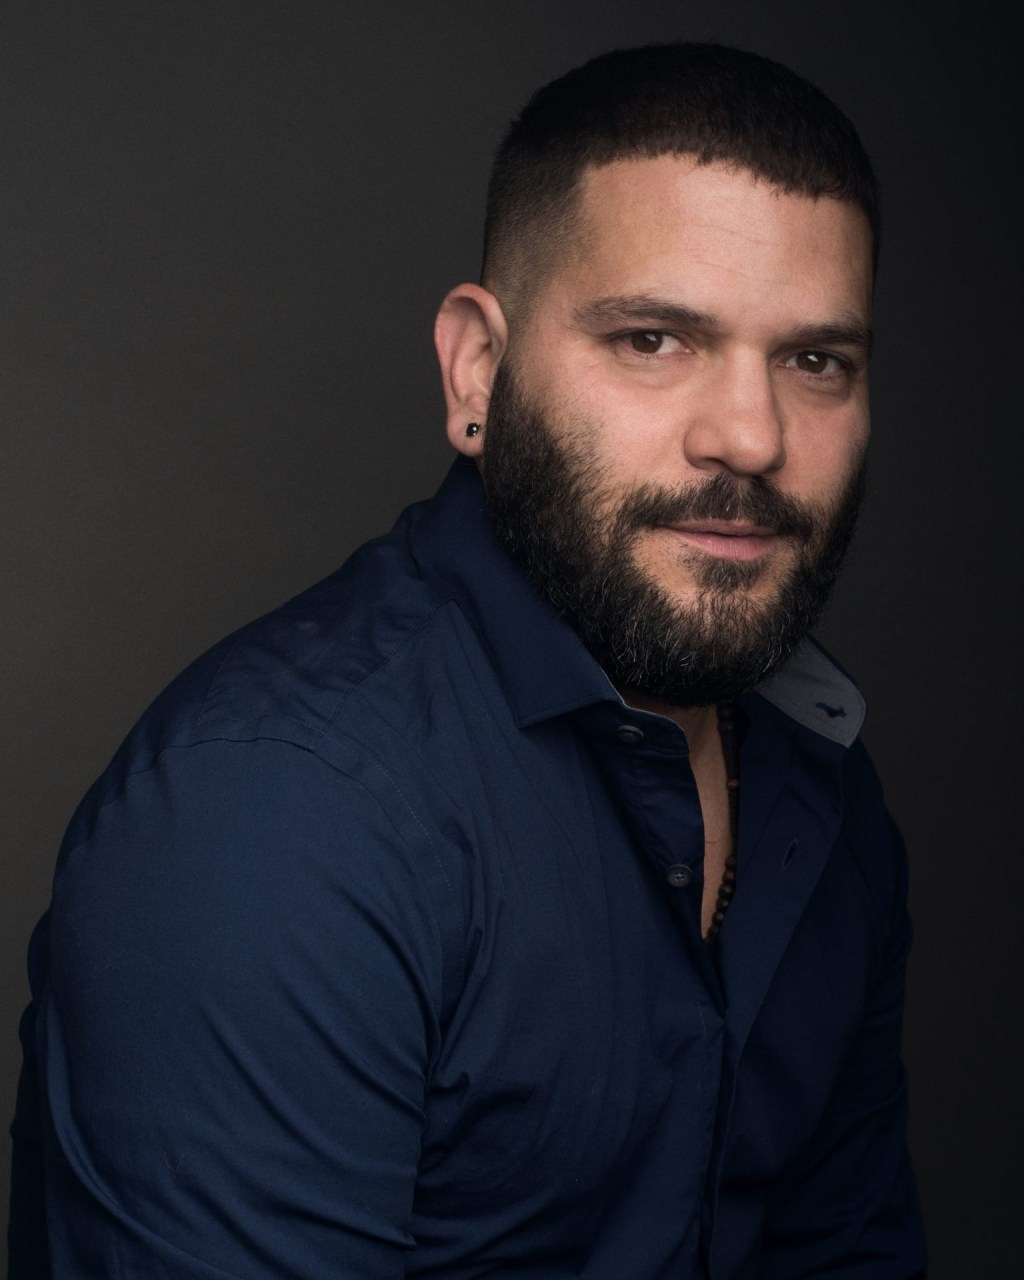 Guillermo Diaz Shirtless